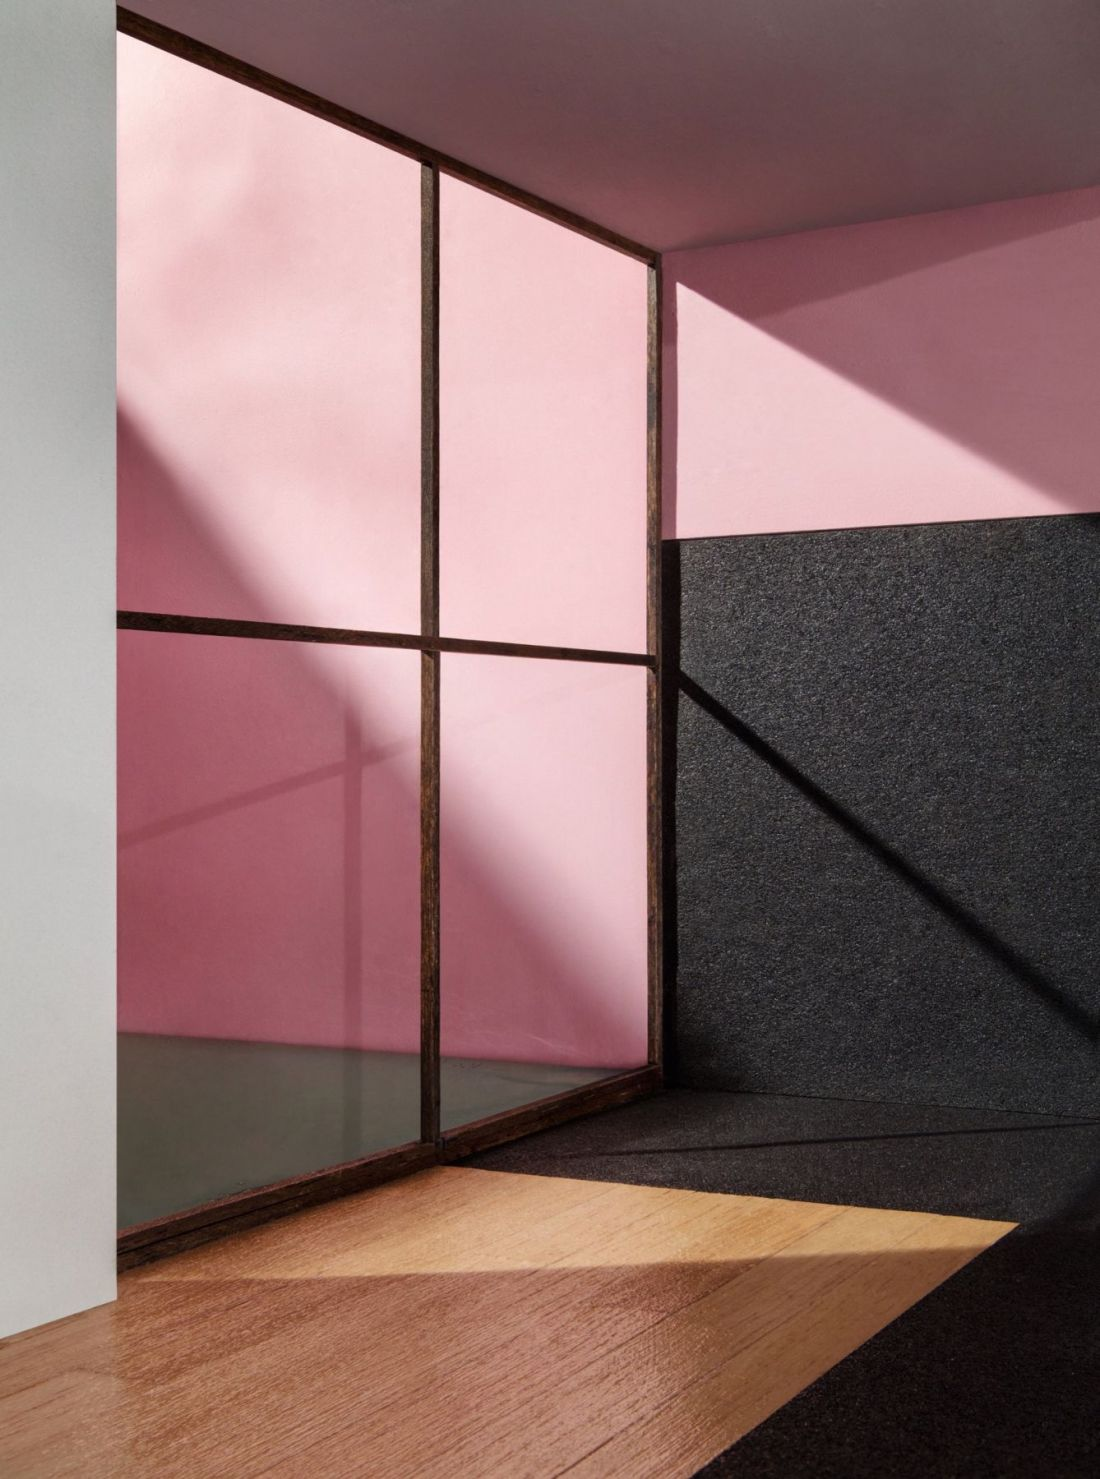 Reception Room, 2017© James Casebere